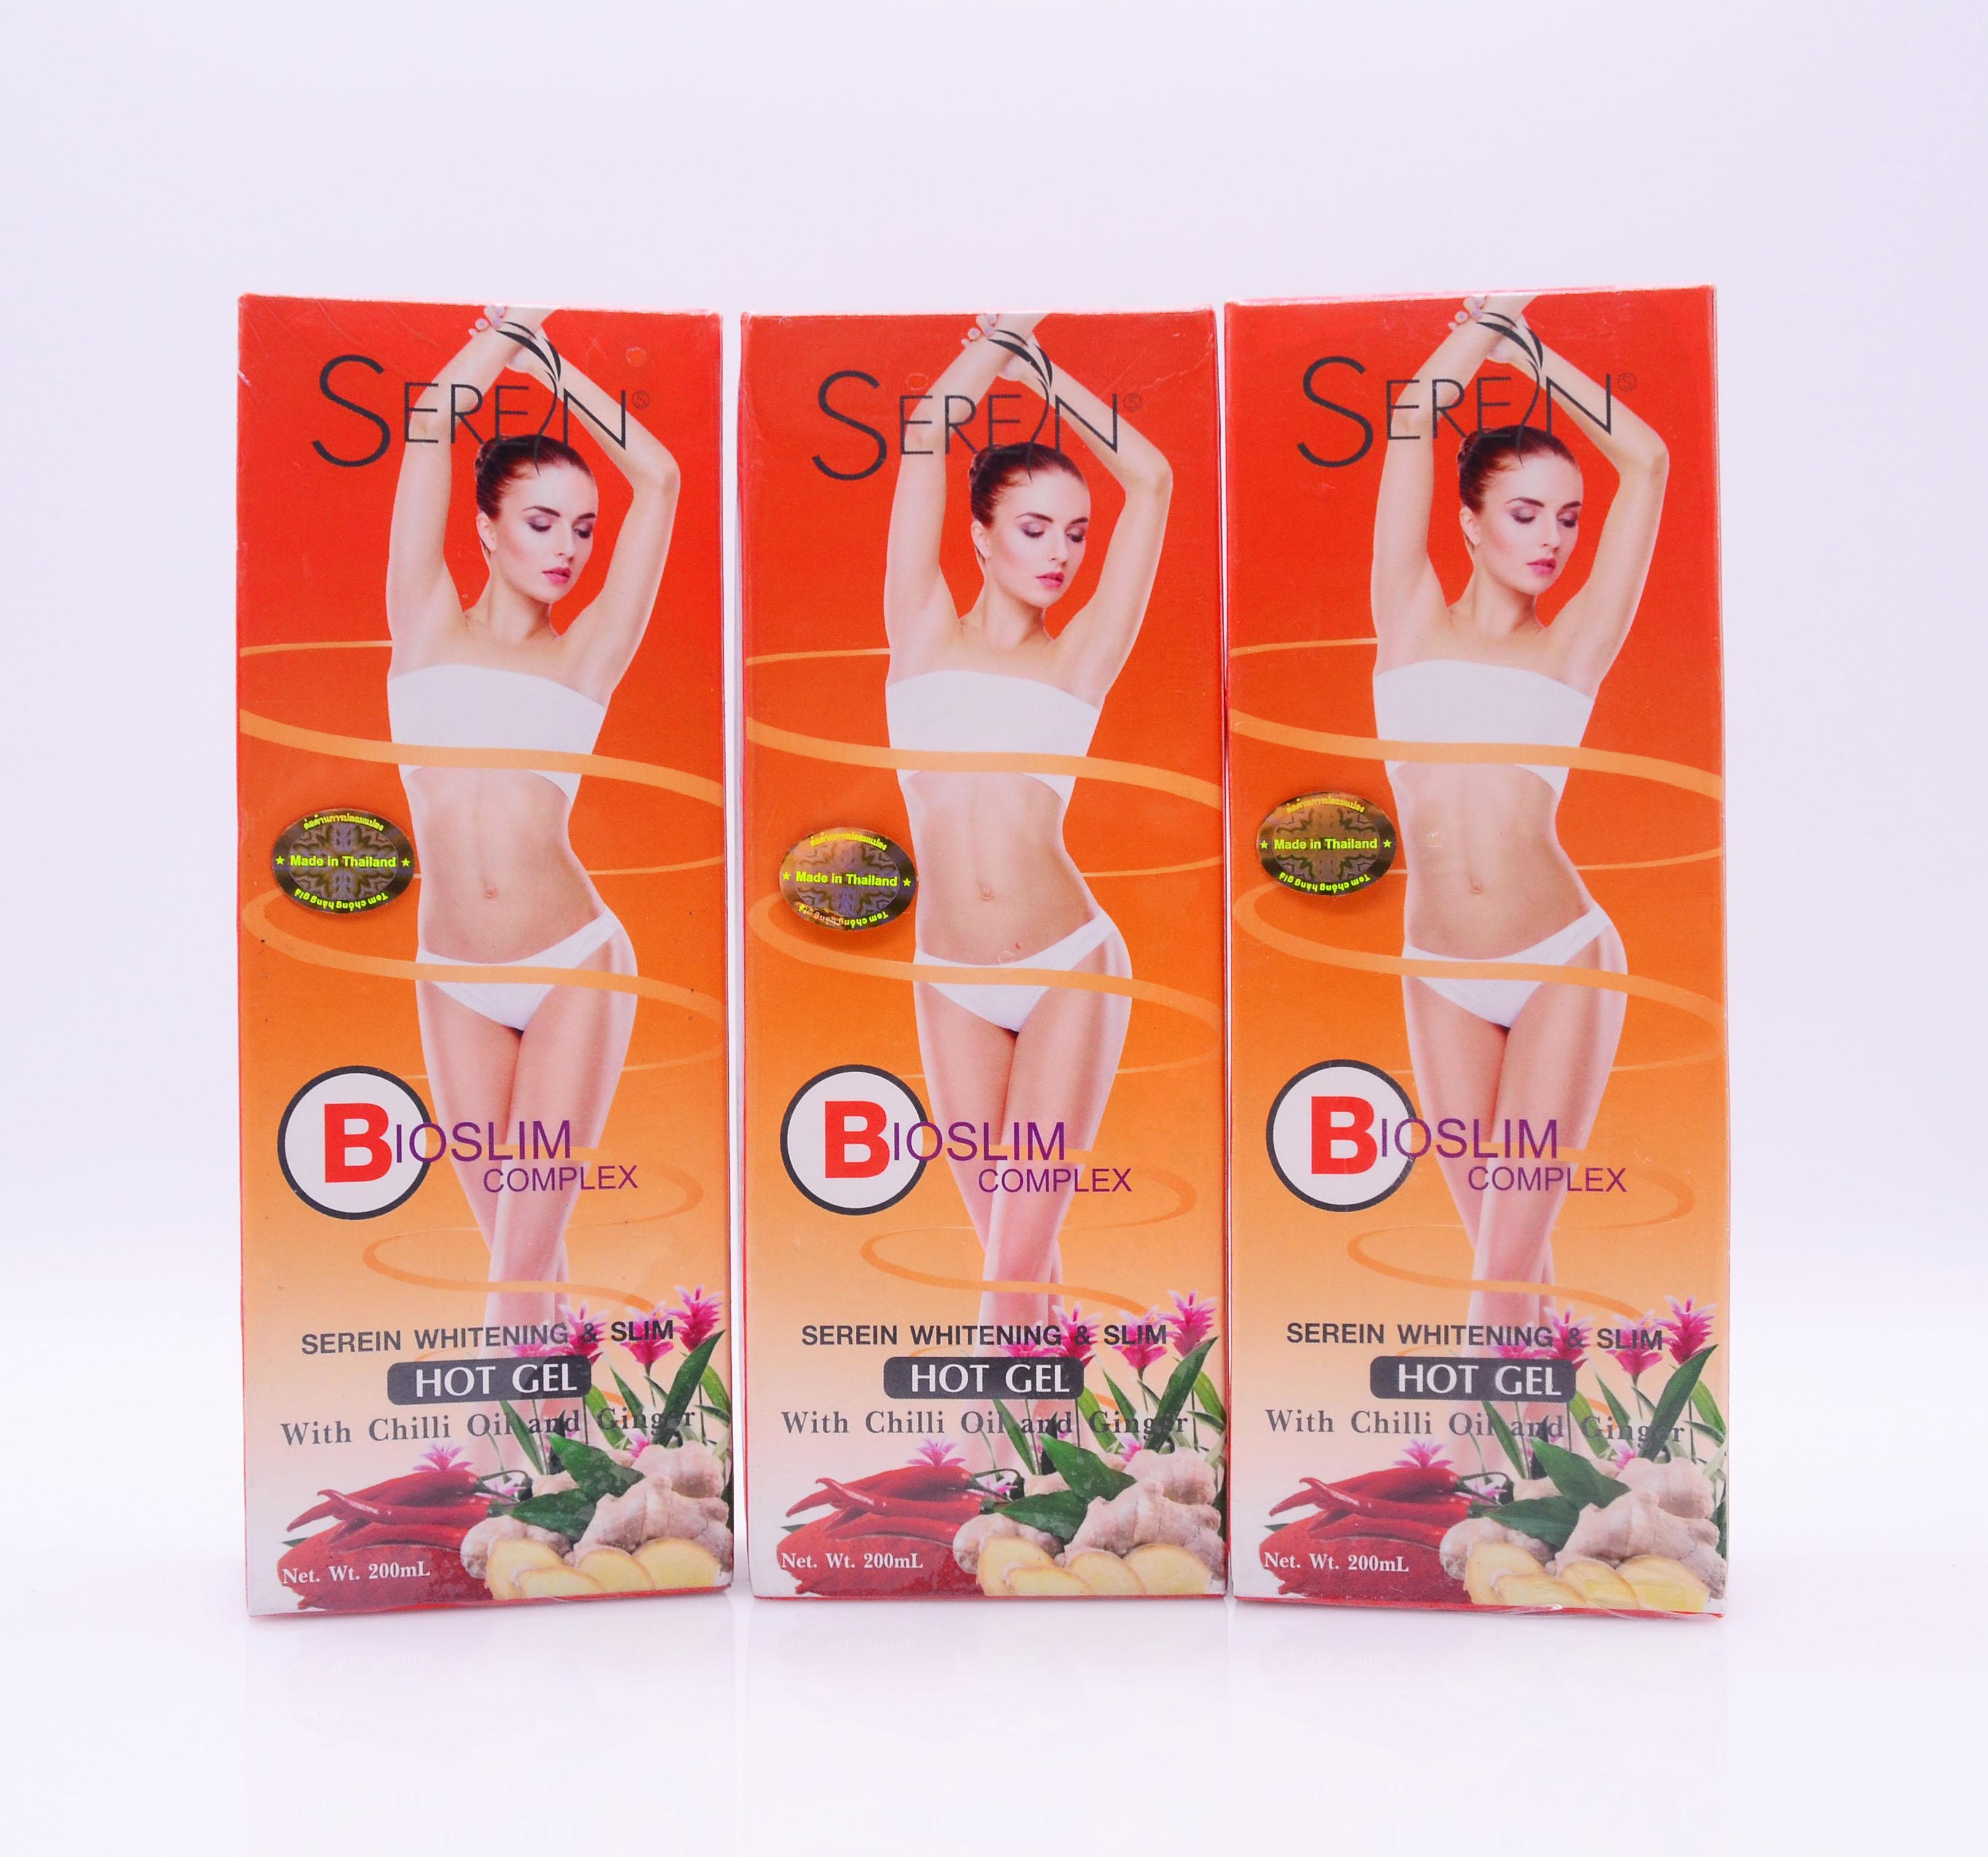 Gel Tan Mỡ Bio Slim SEREN GỪNG ỚT (Trắng Da & Giảm Mỡ) Thái Lan 200ml